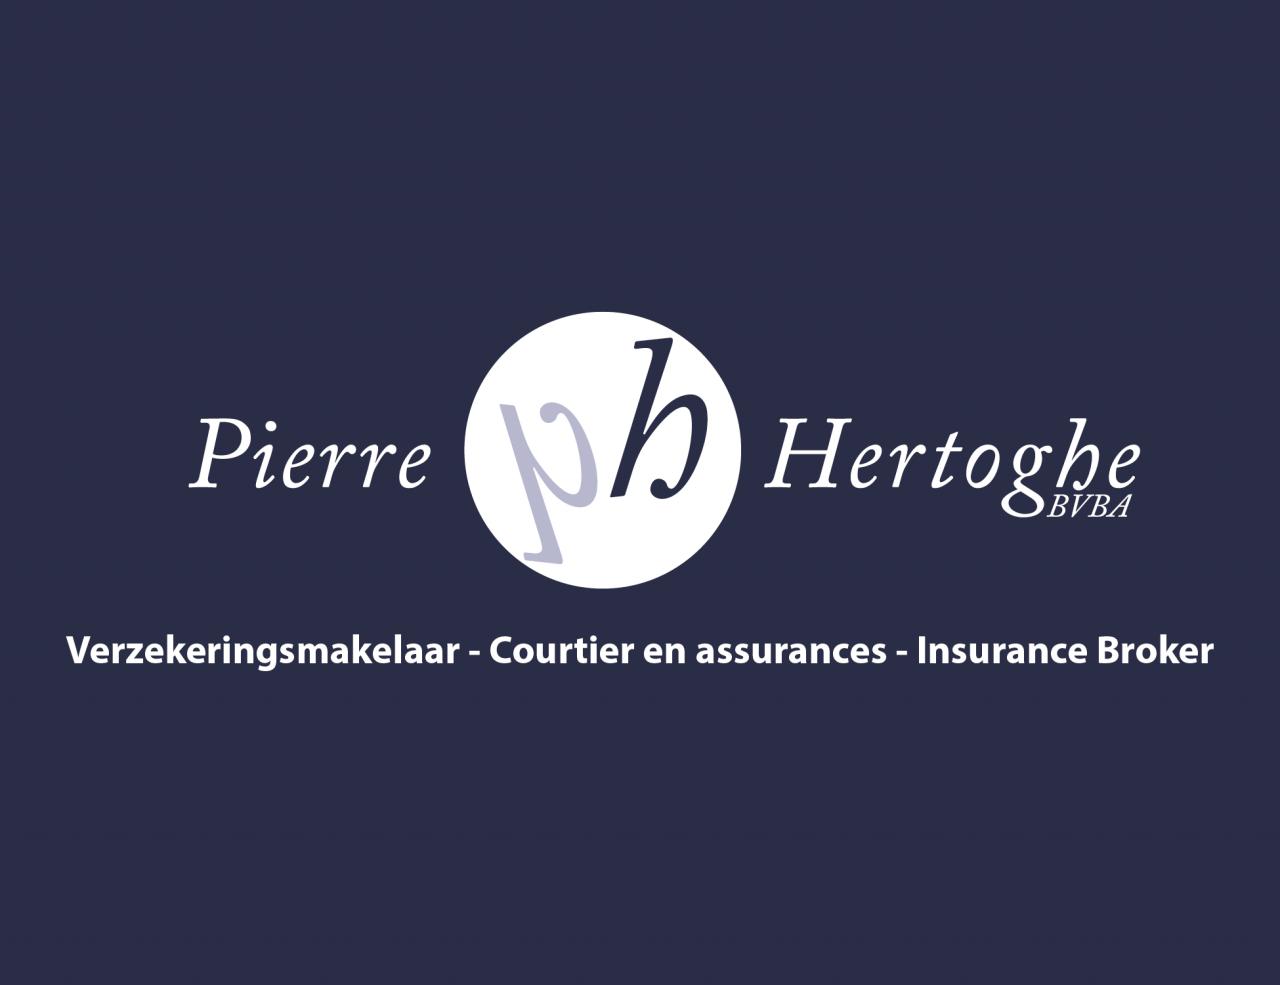 Pierre Hertoghe